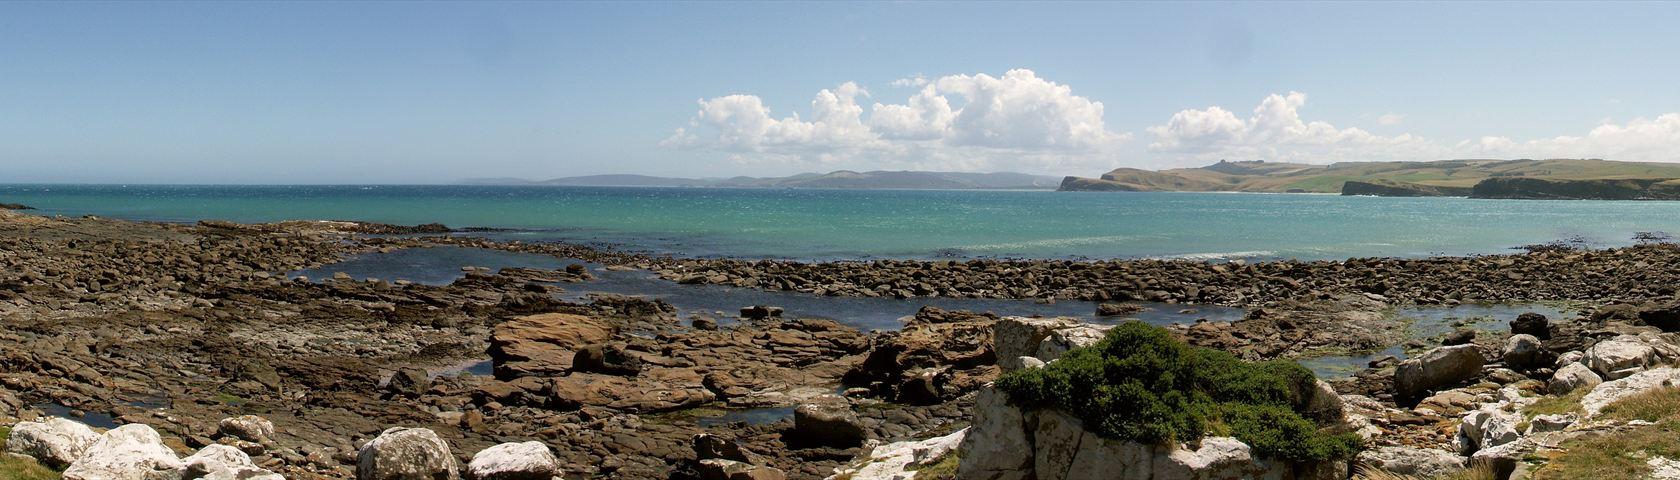 Catlins Coast Panorama